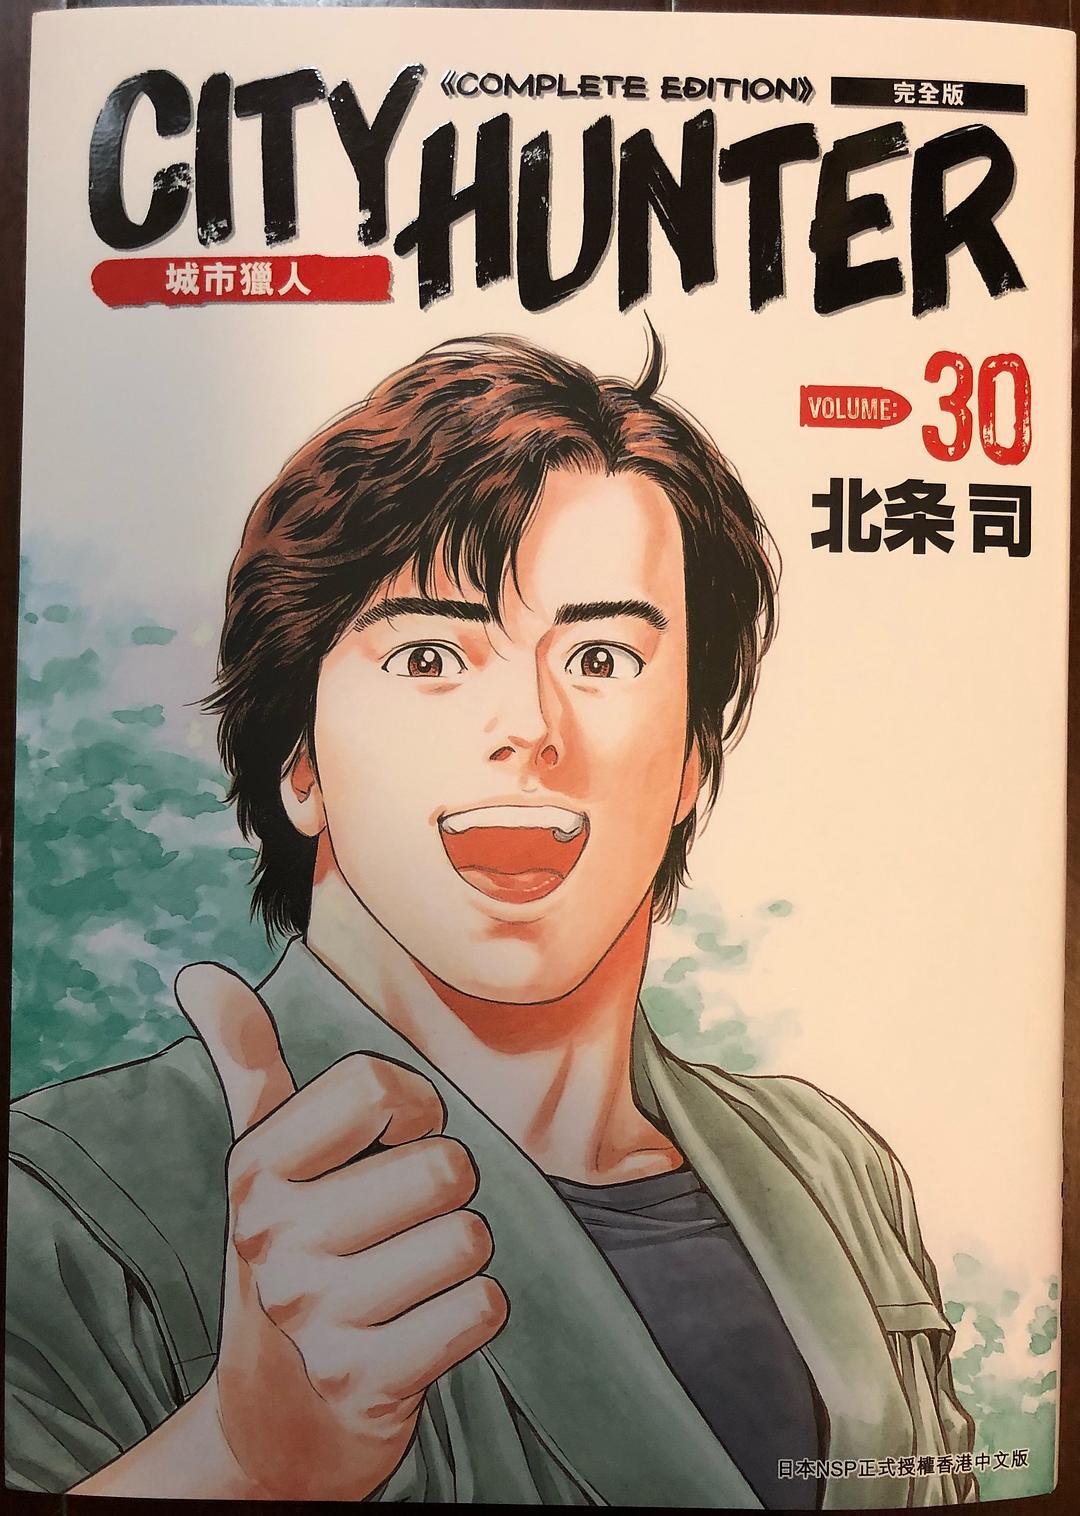 City Hunter 完全版 30